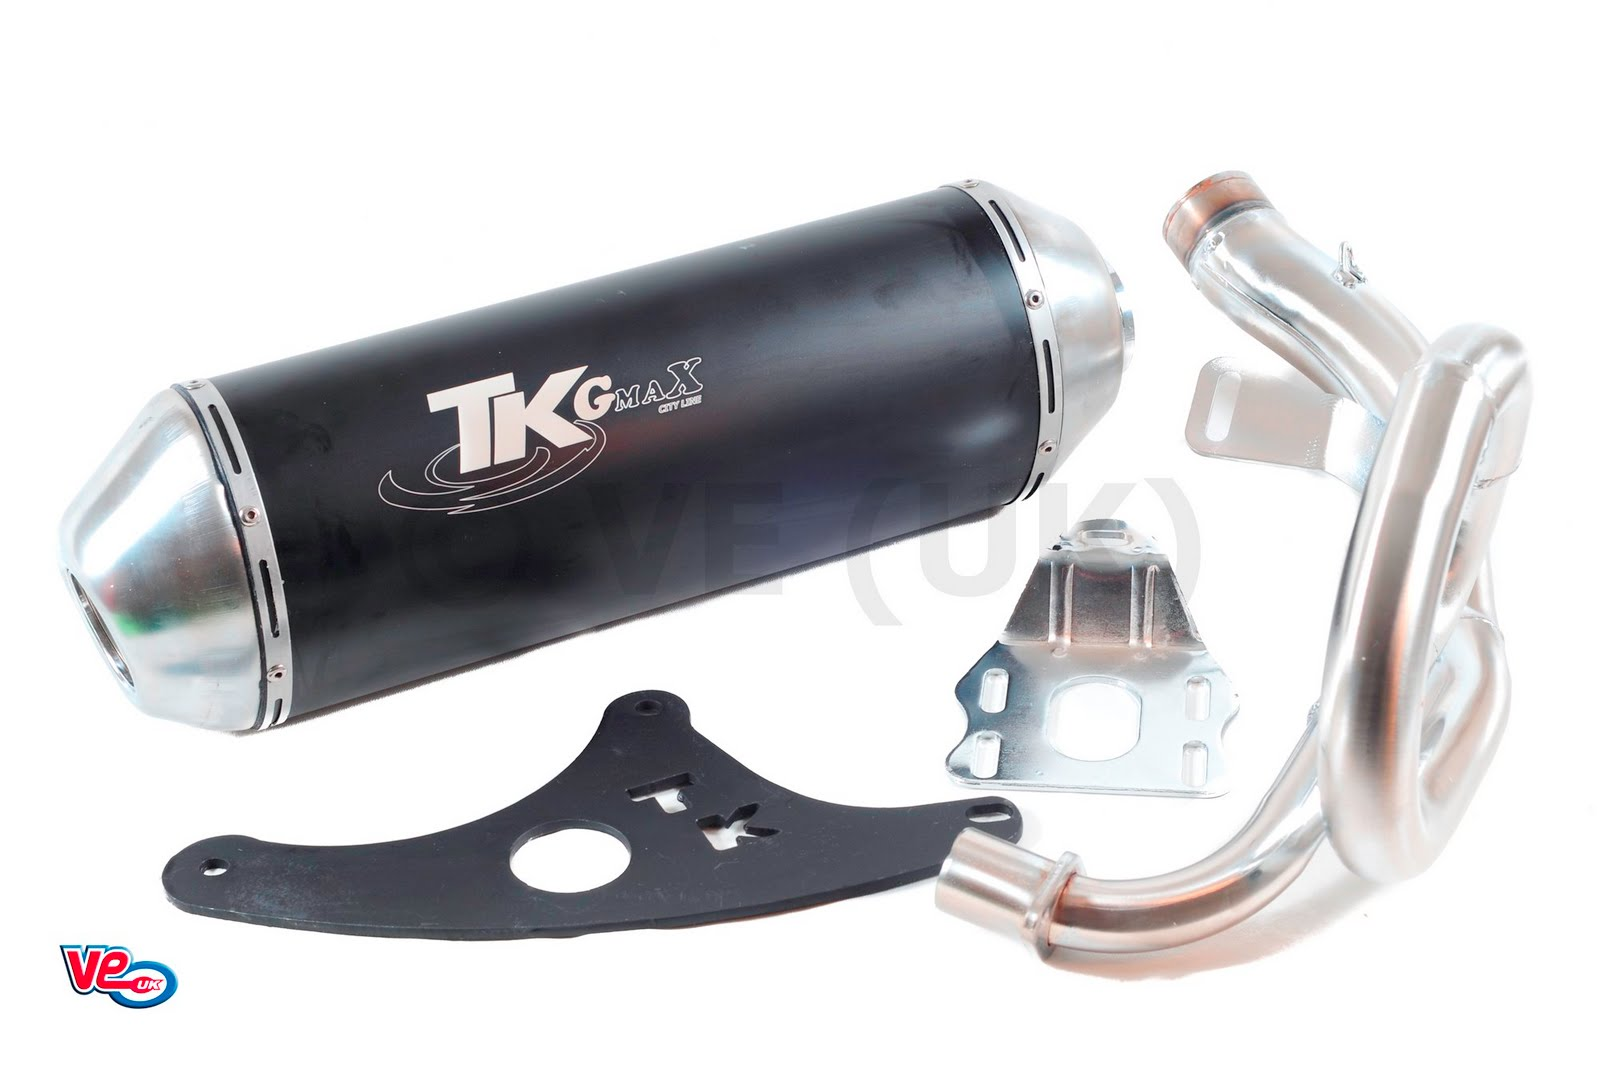 Moped Turbo Kit : Ve scooter spares turbo kit gmax city line maxi